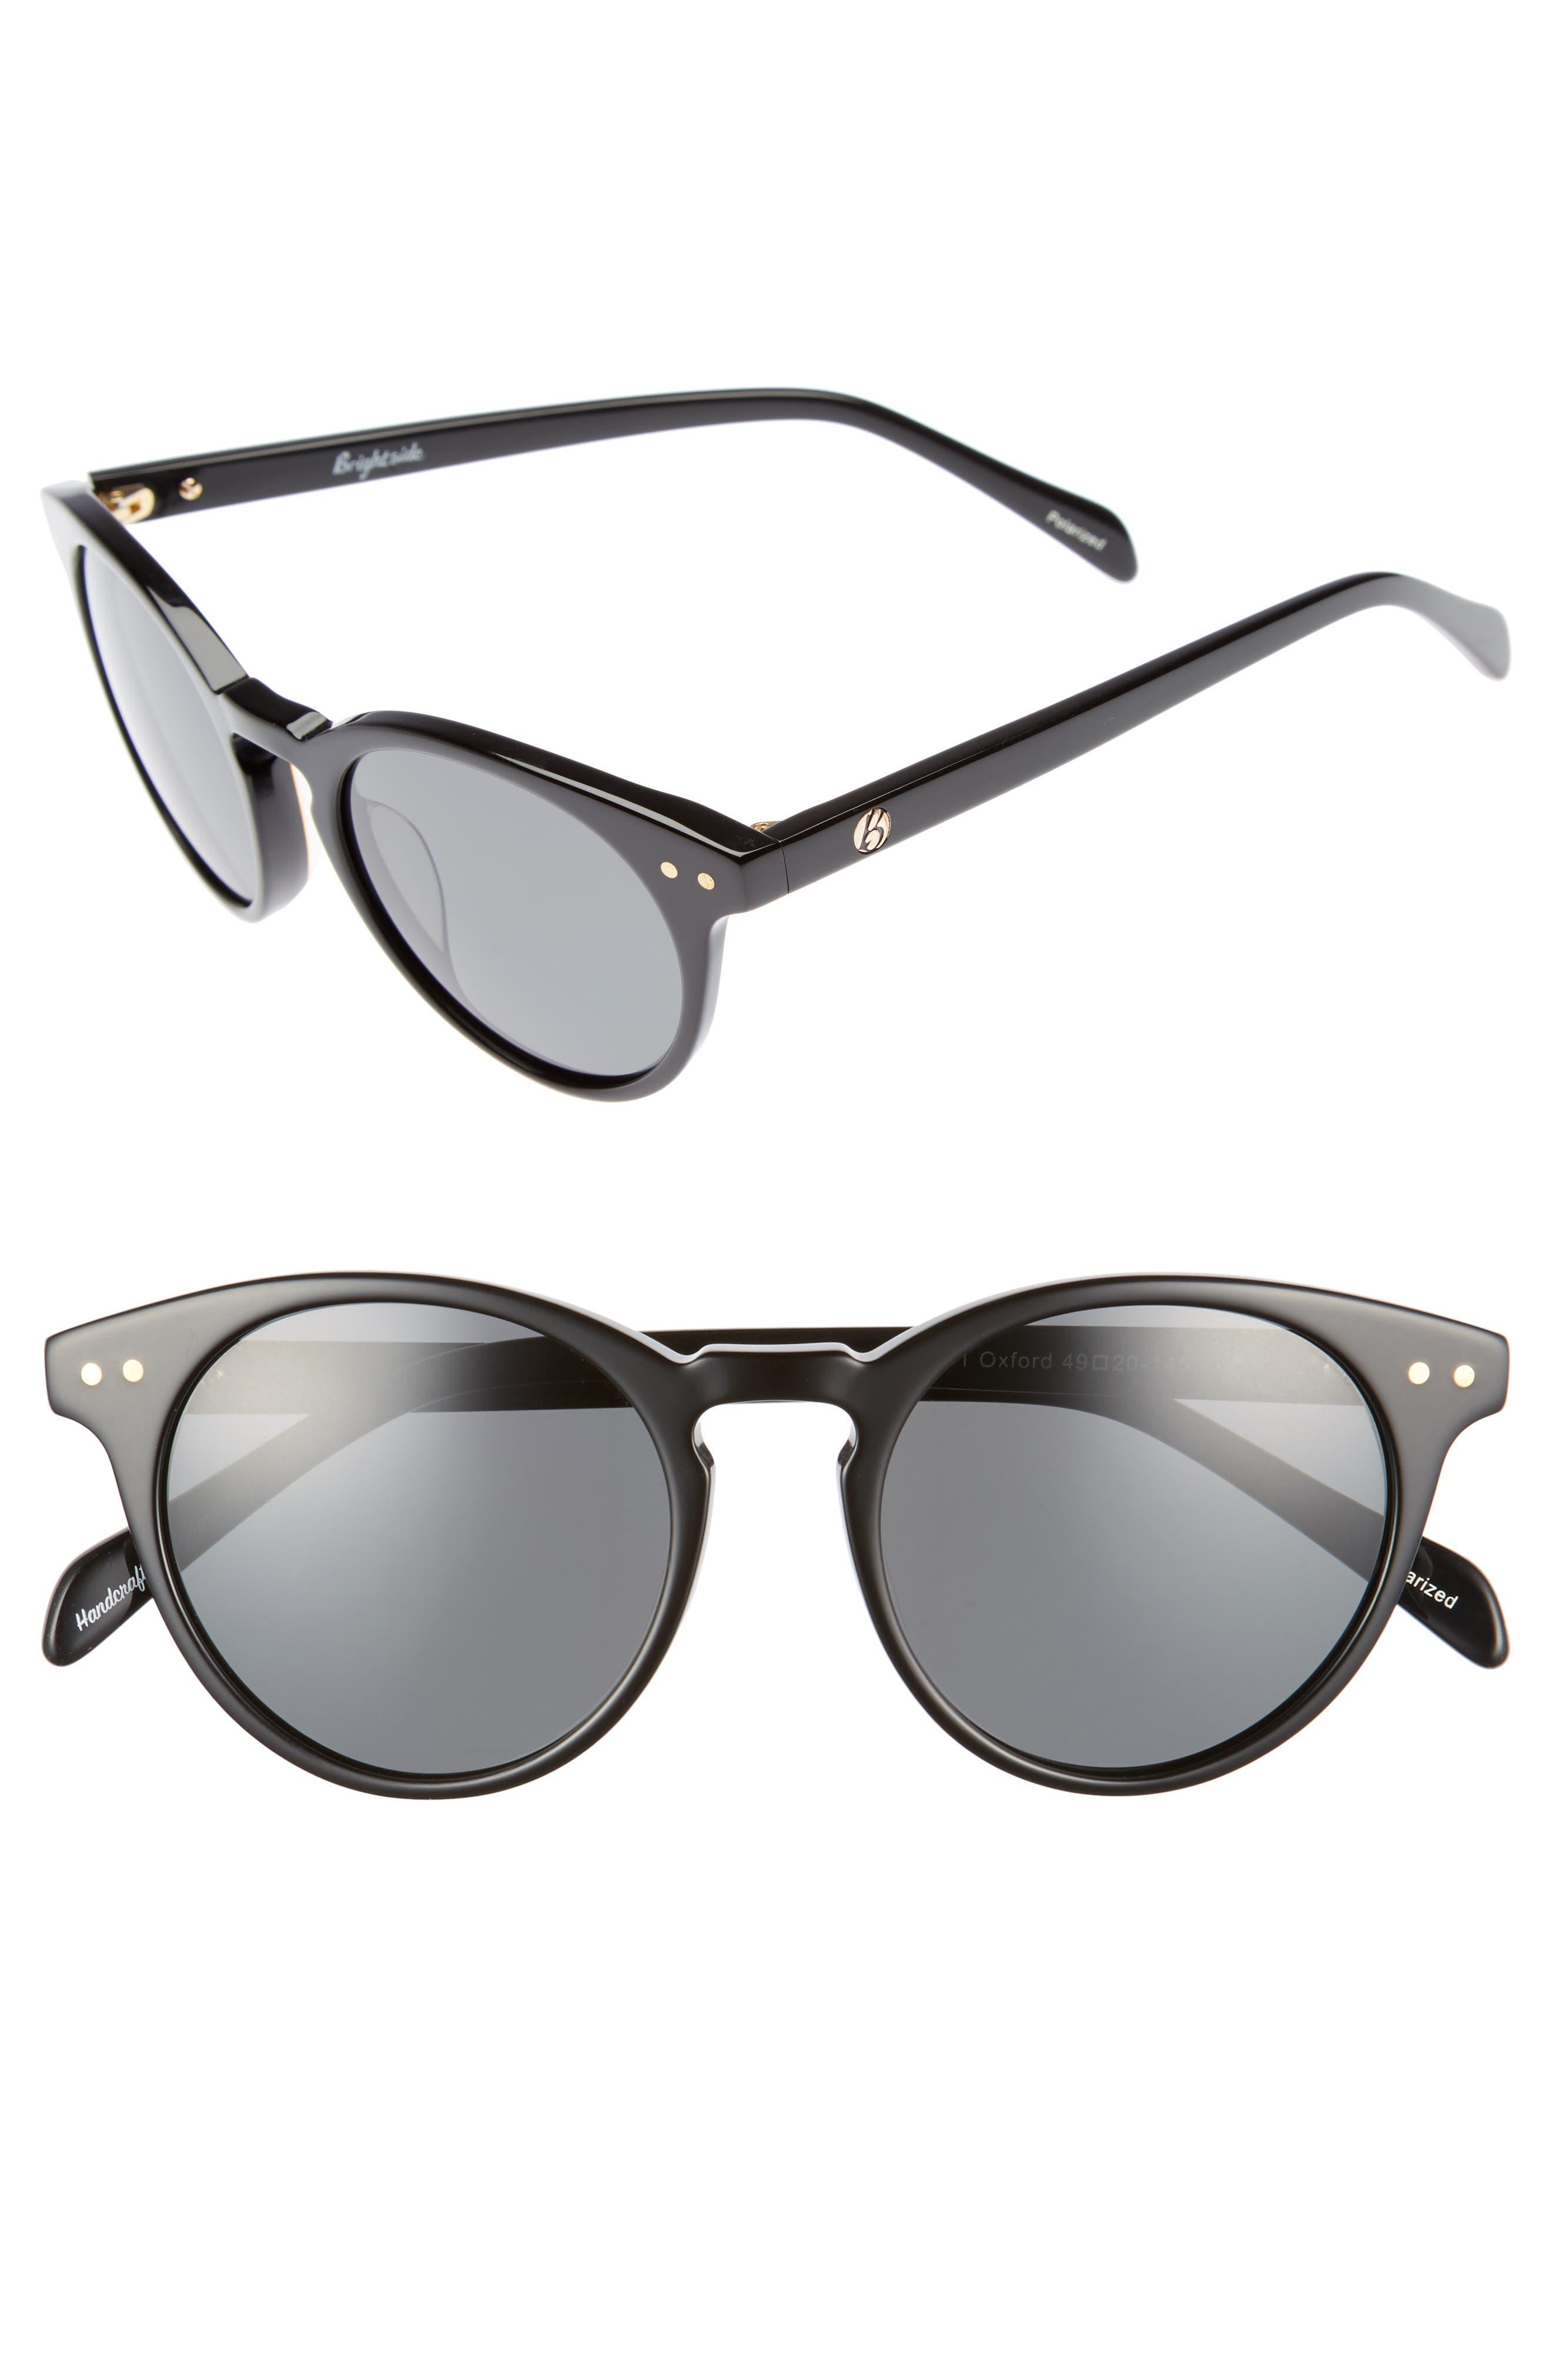 Oxford 49mm Polarized Sunglasses,                             Main thumbnail 1, color,                             001